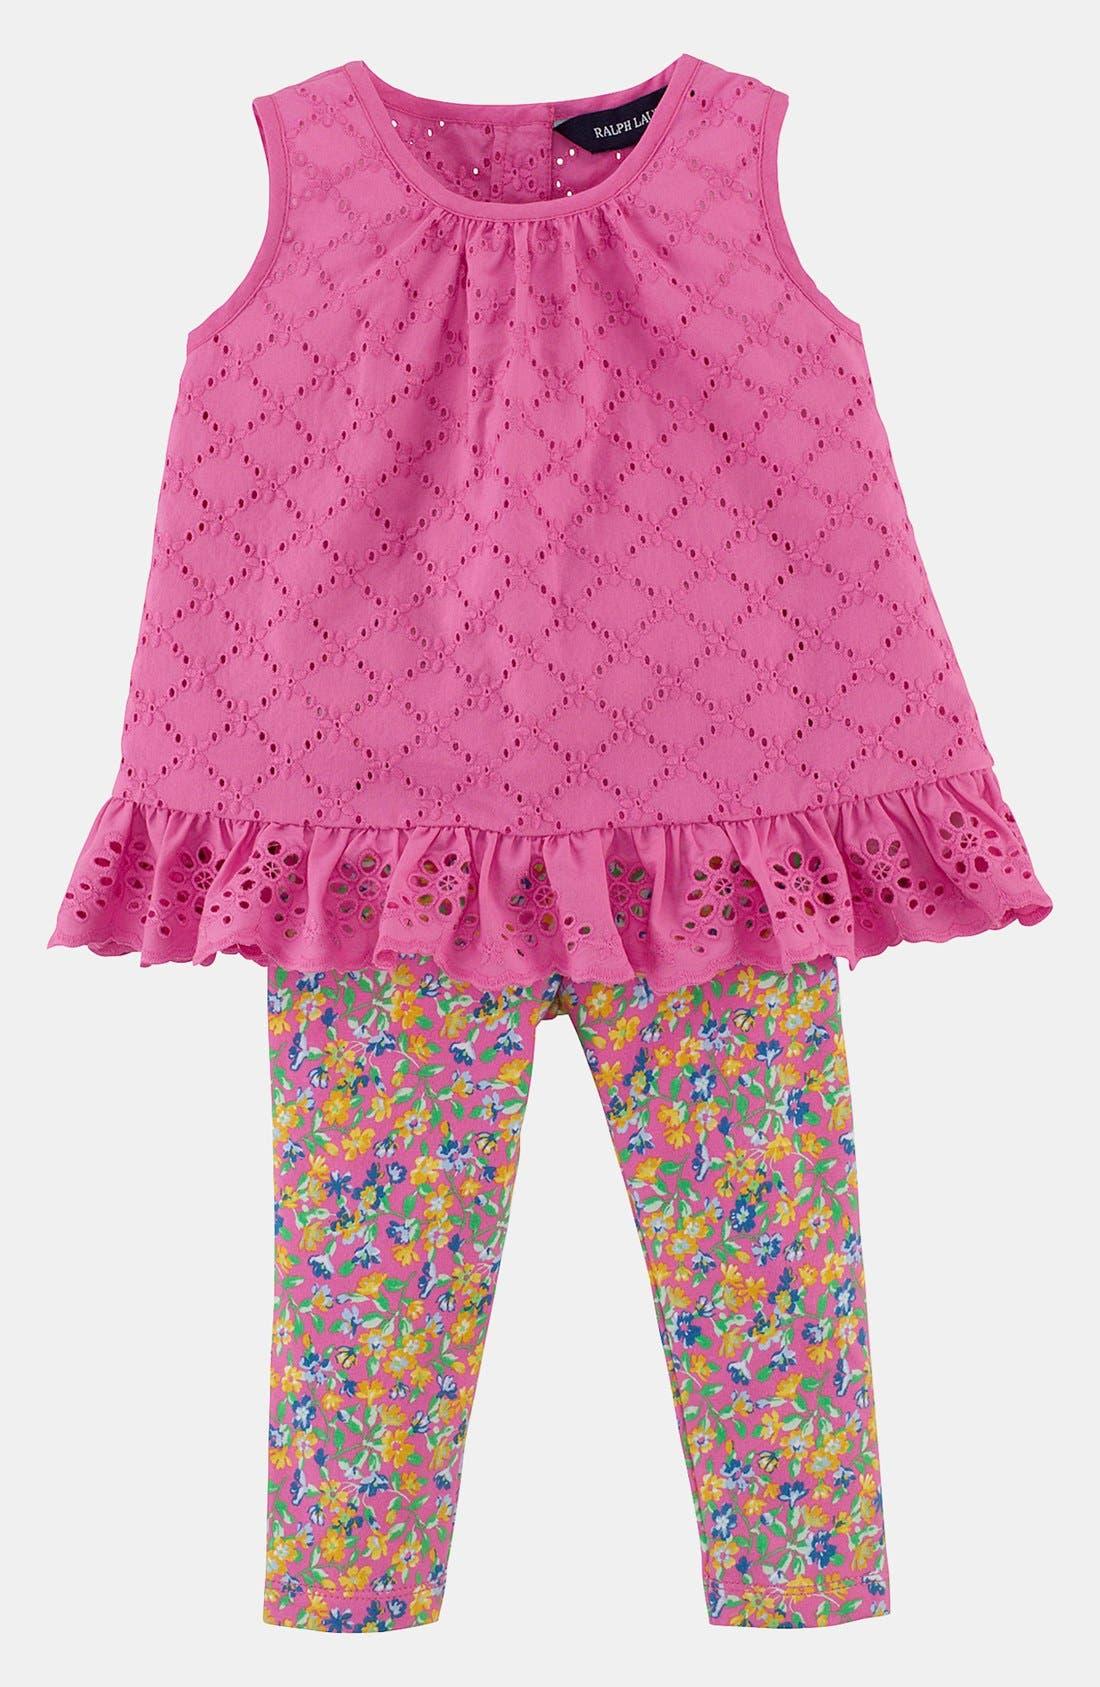 Alternate Image 1 Selected - Ralph Lauren Eyelet Top & Leggings (Baby)